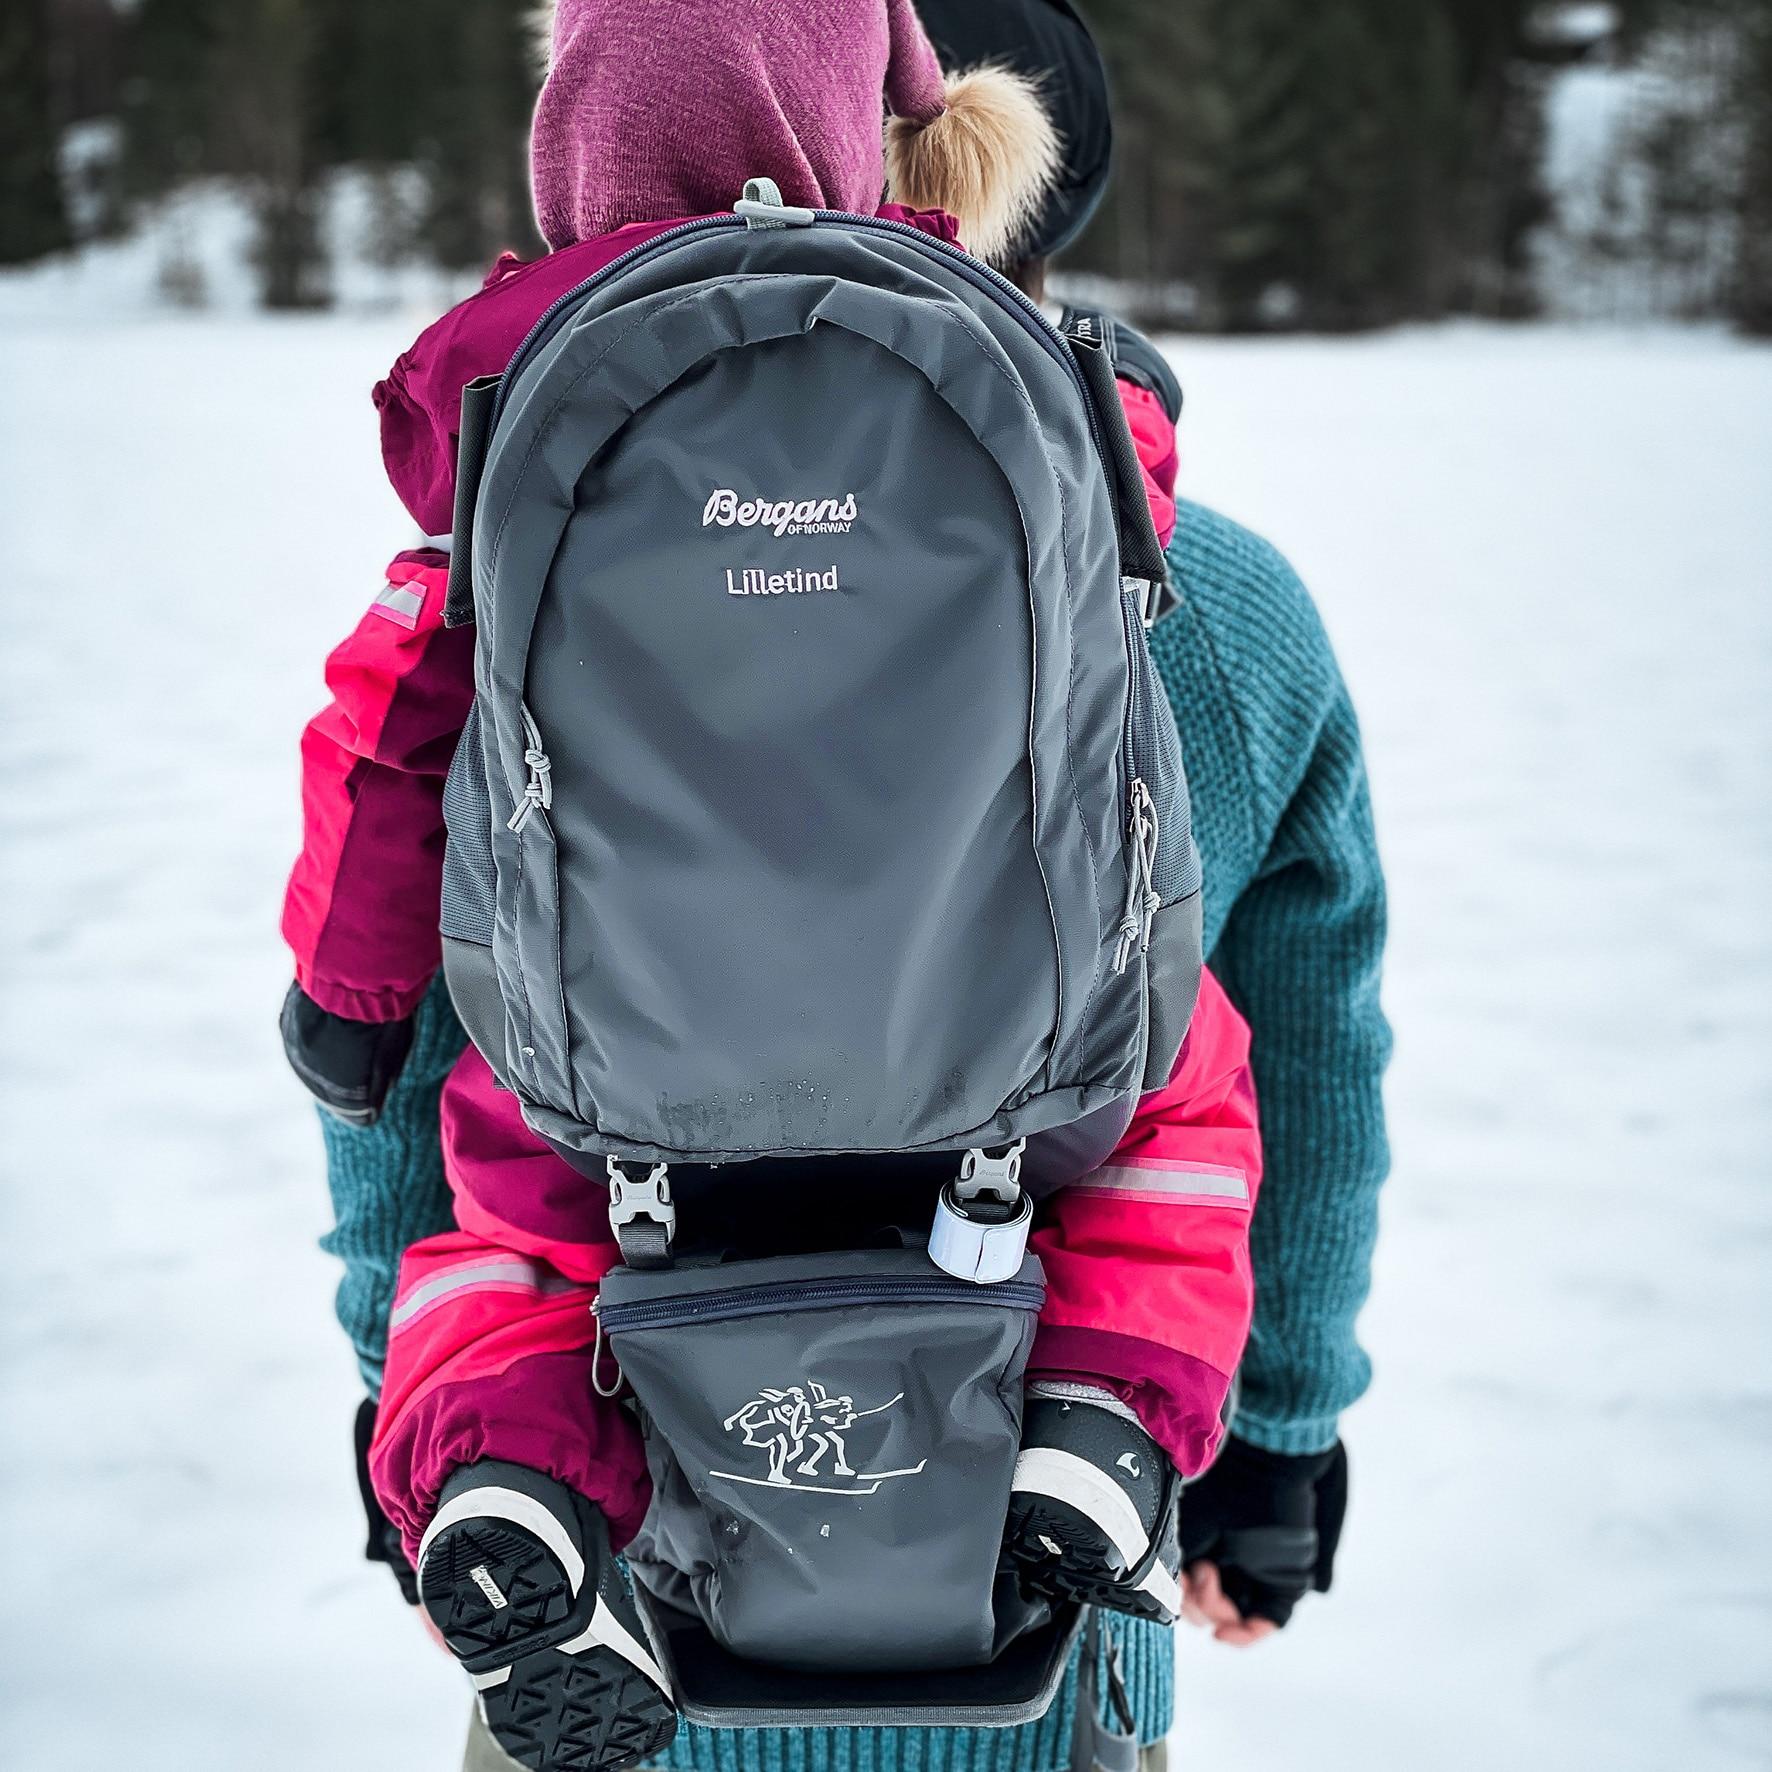 Lilletind Child Carrier